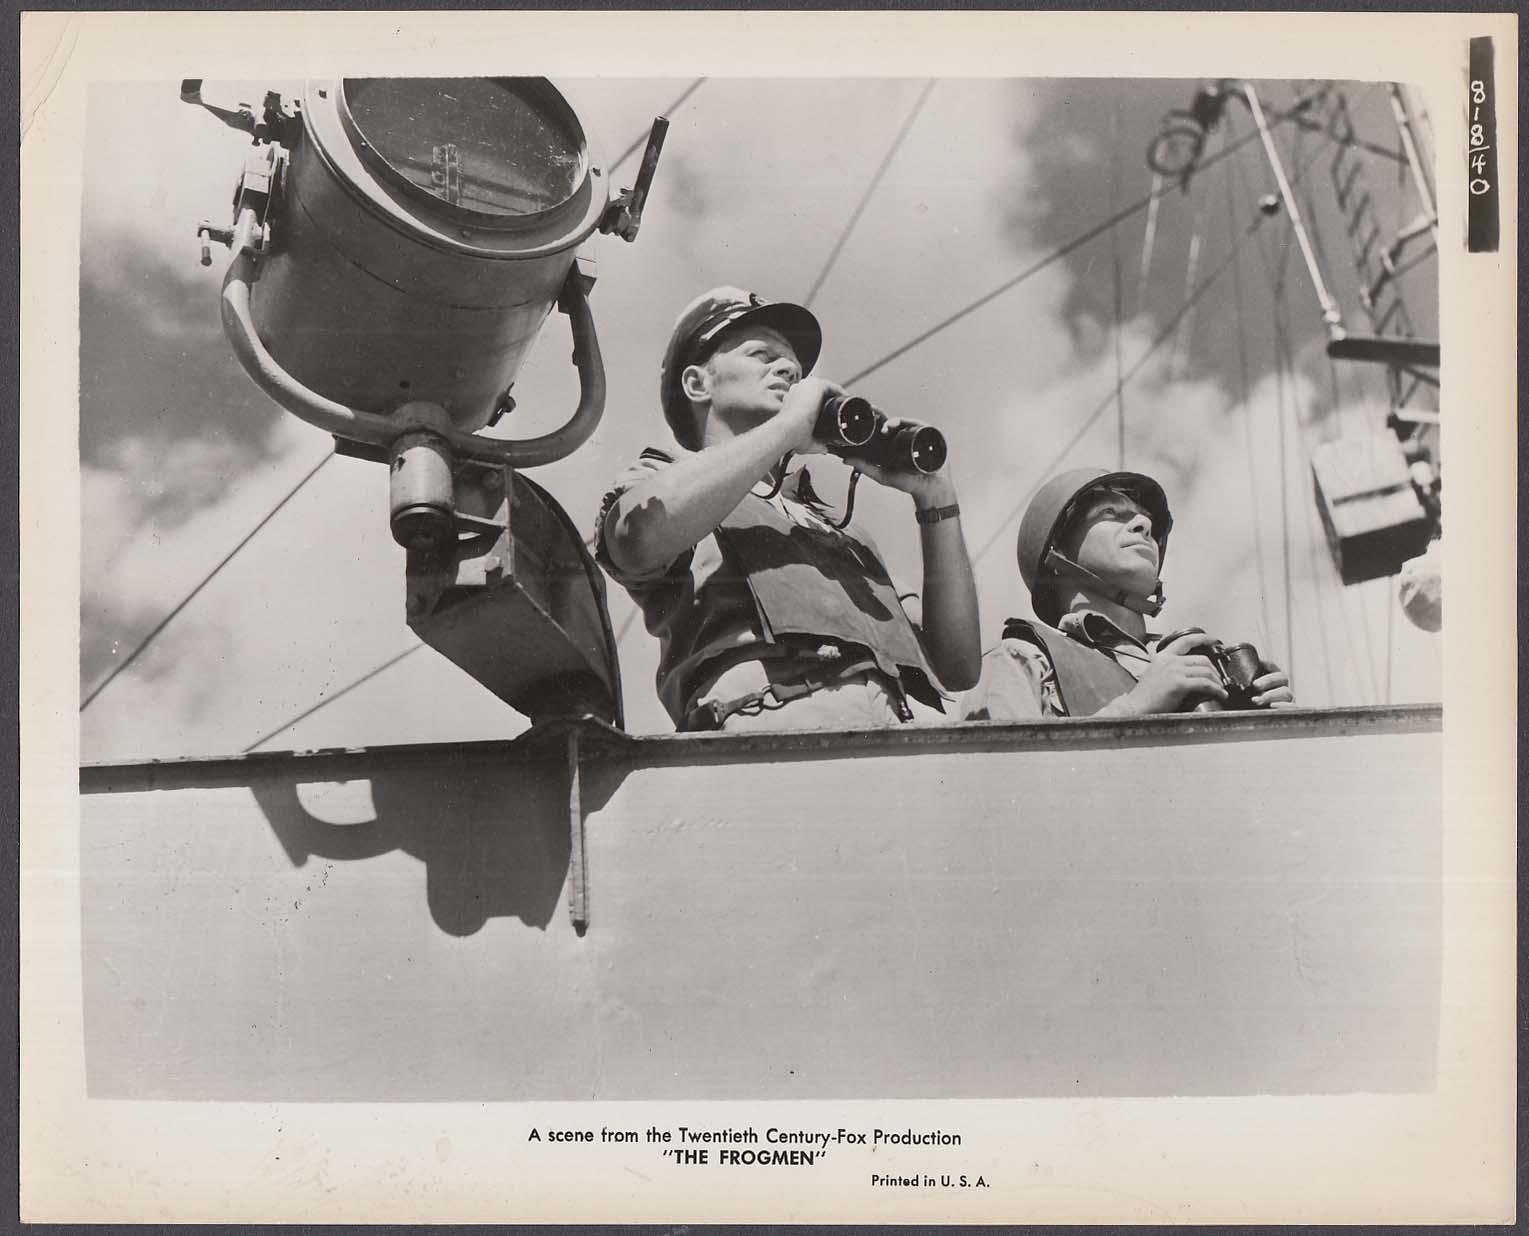 Richard Widmark on deck with binoculars The Frogmen 8x10 photo 1951